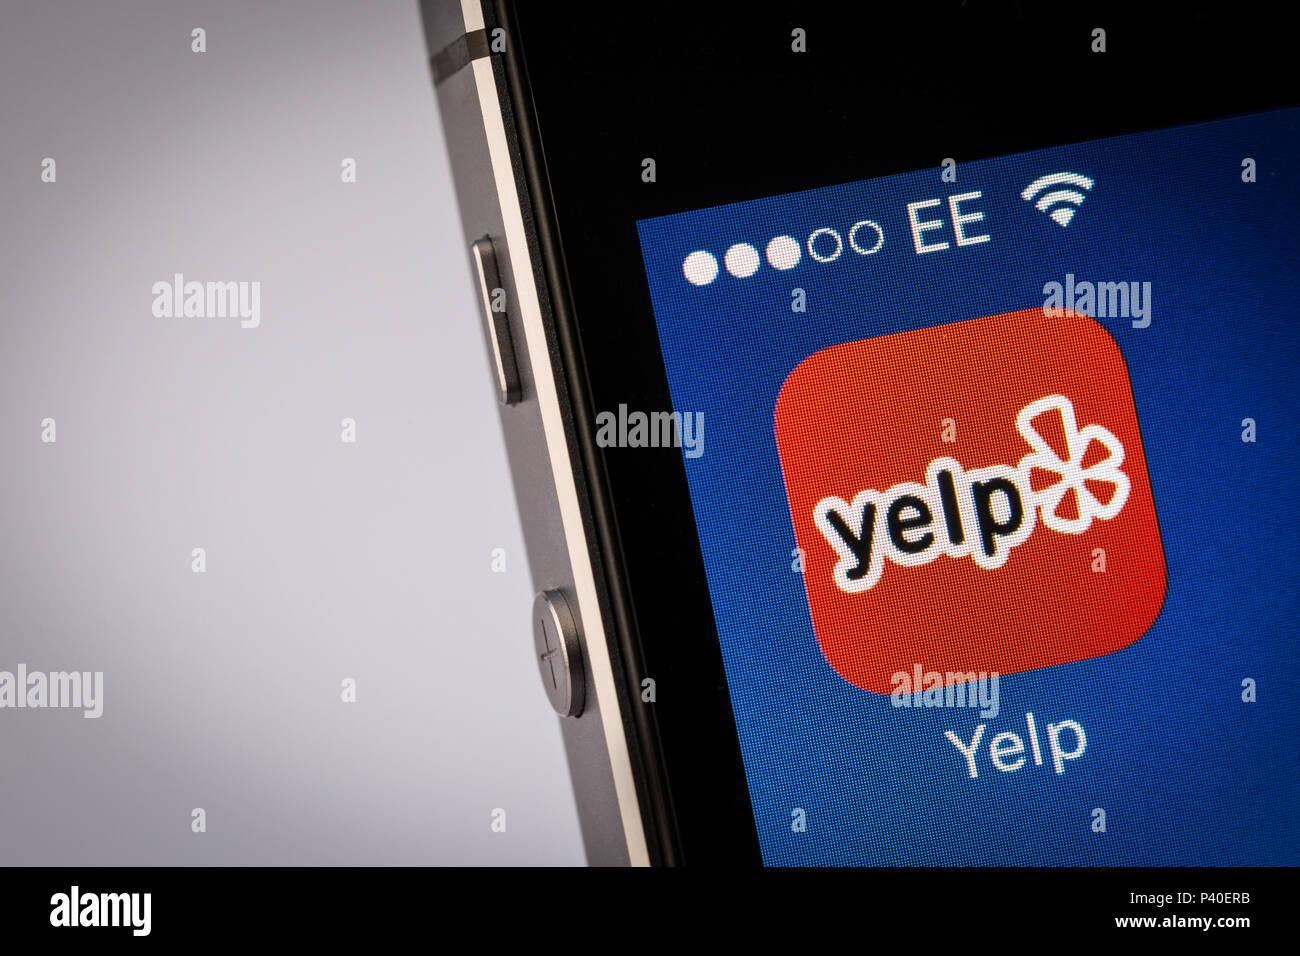 Yelp App on an iPhone smartphone Stock Photo: 208994671 - Alamy